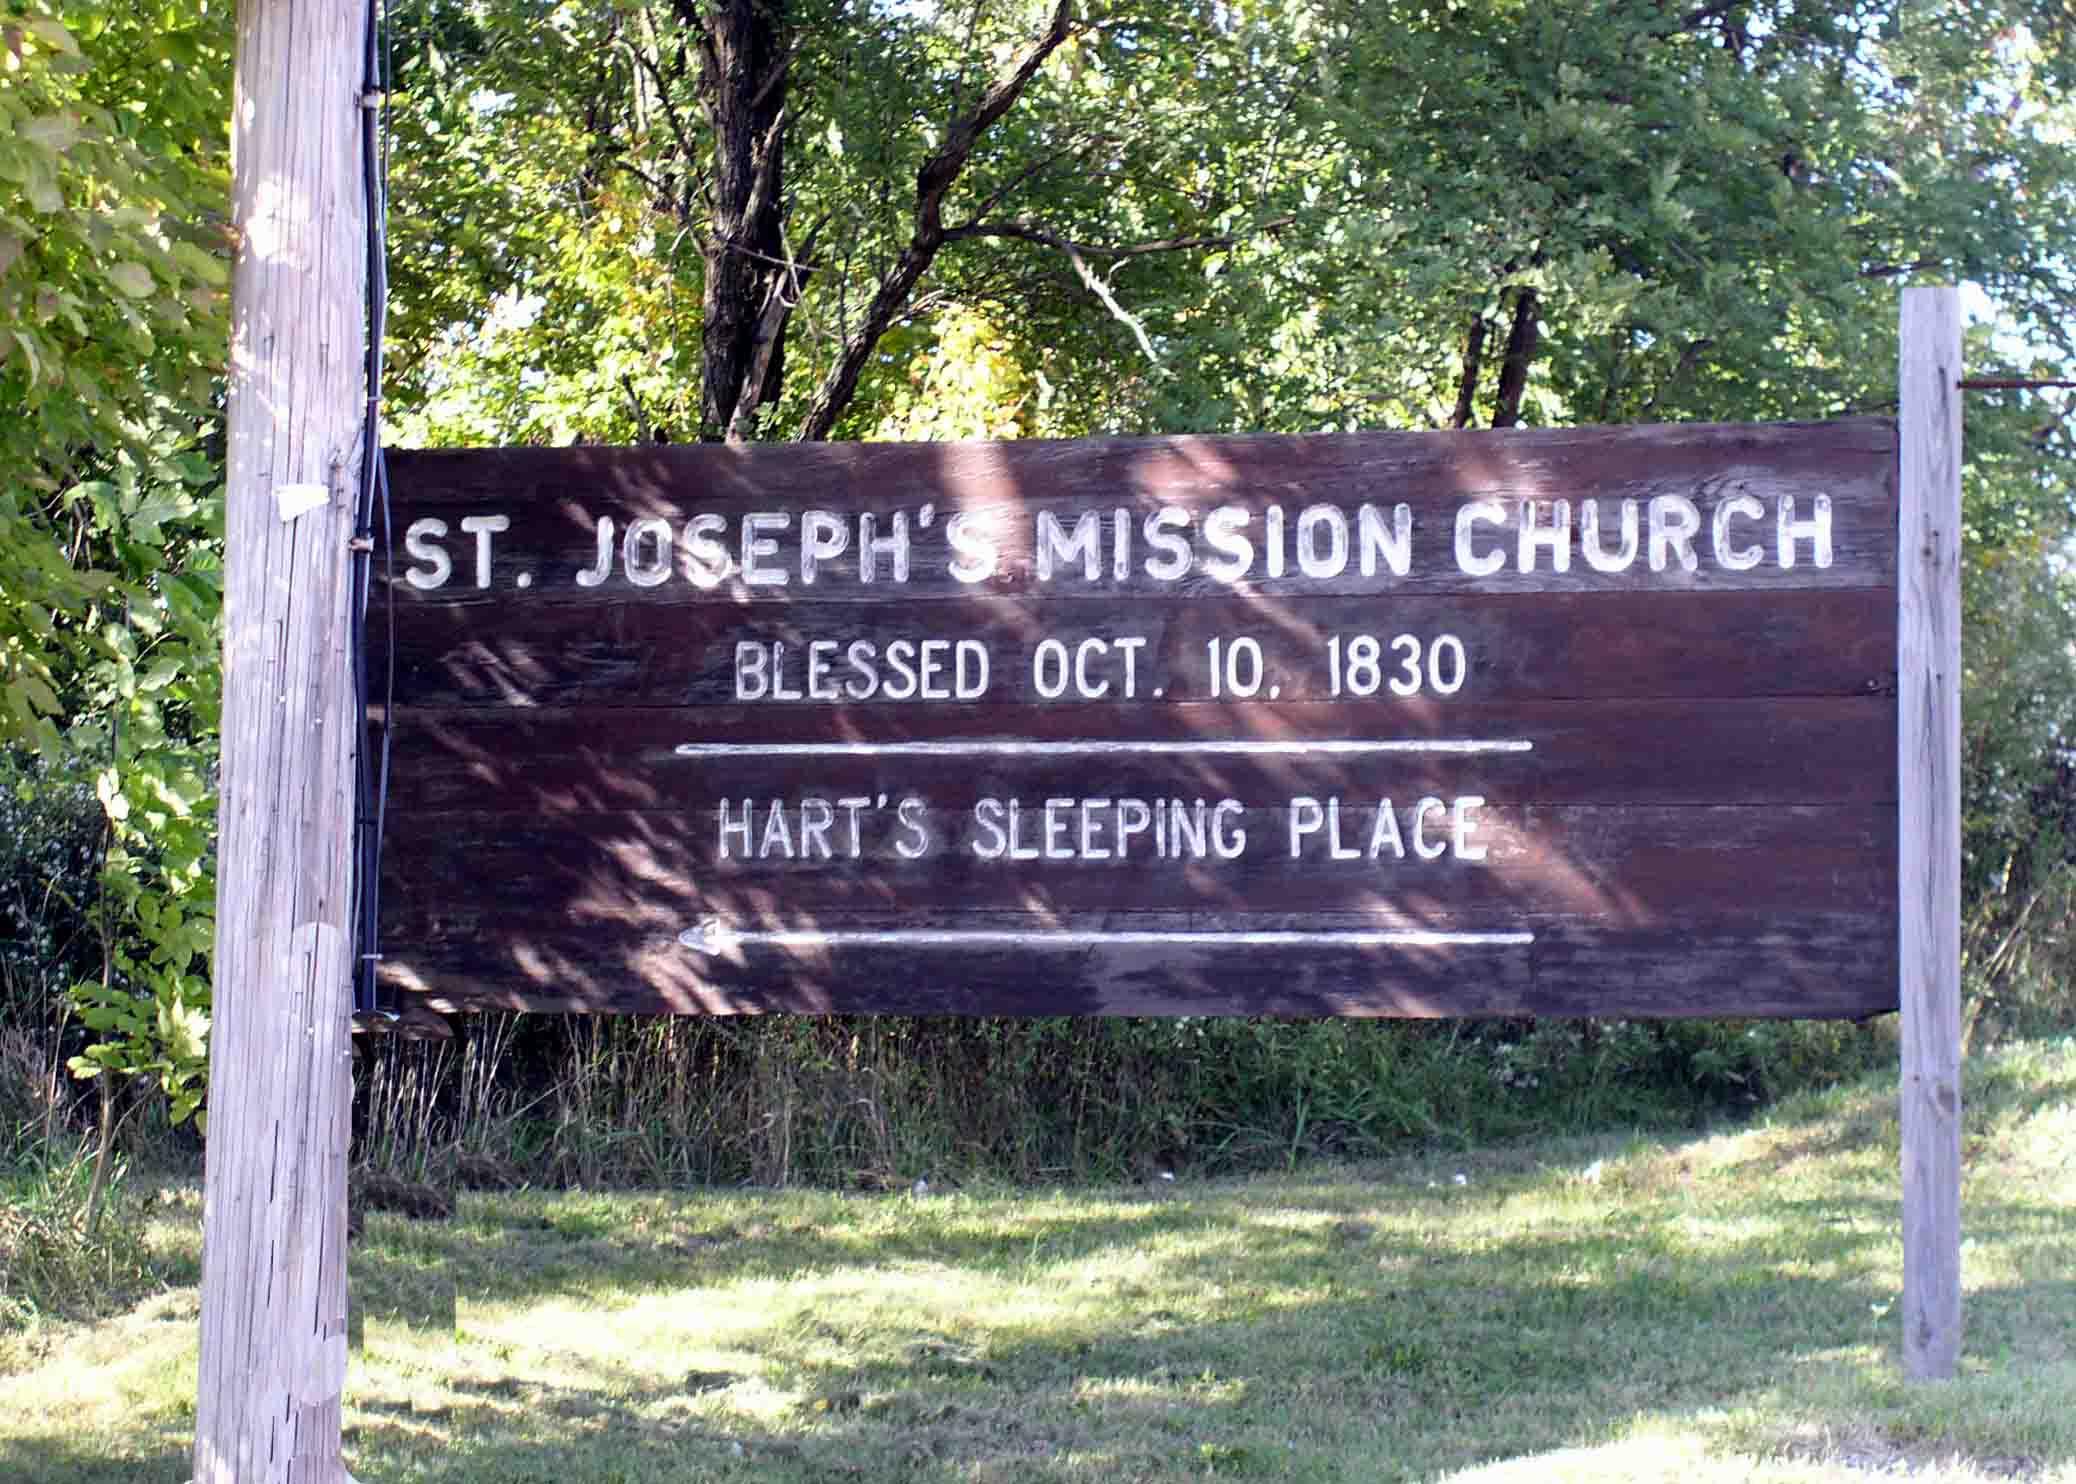 Saint joseph s mission church hart s sleeping place